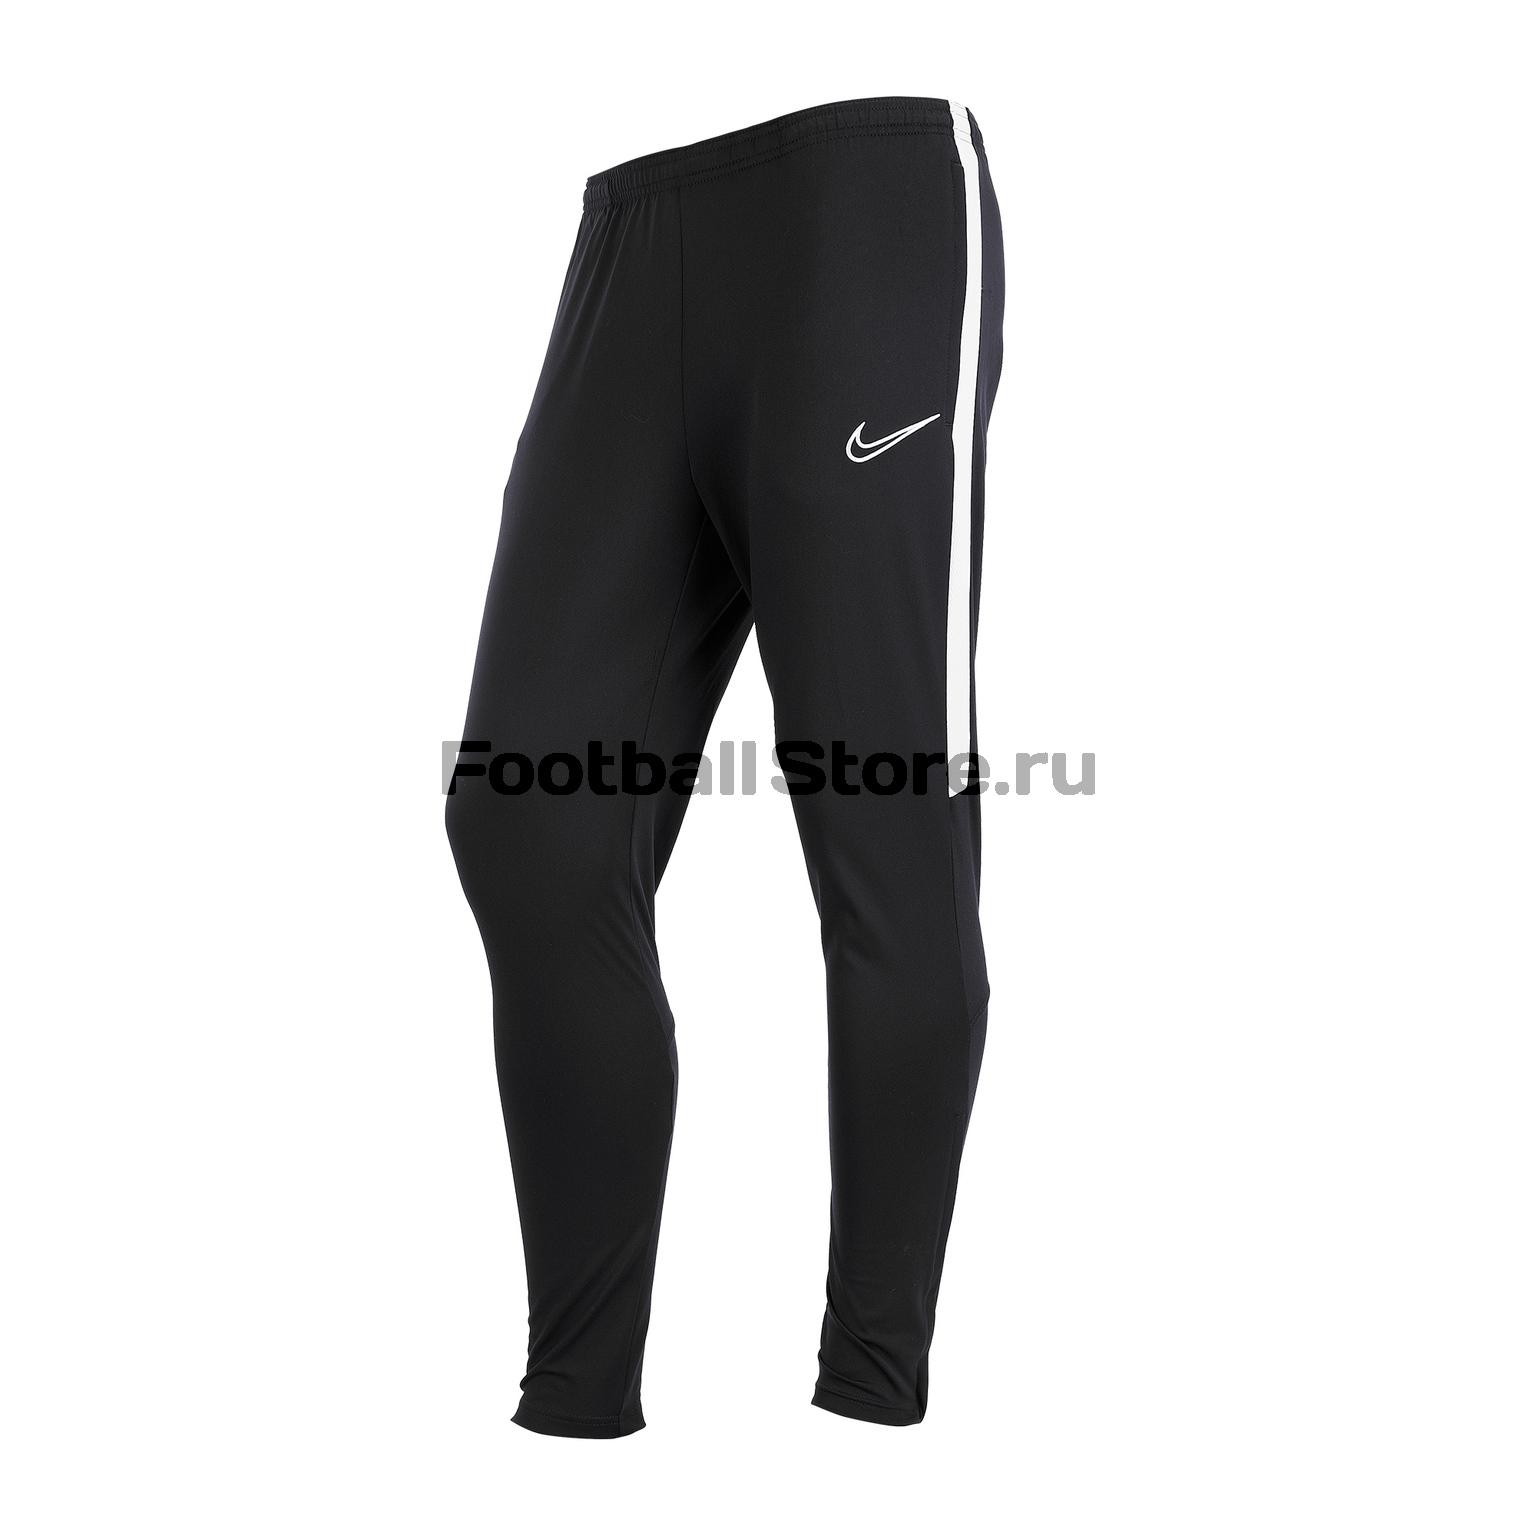 Брюки тренировочные Nike Dry Academy19 Pant AJ9181-010 nike nike found 12 poly pant boys 476747 010